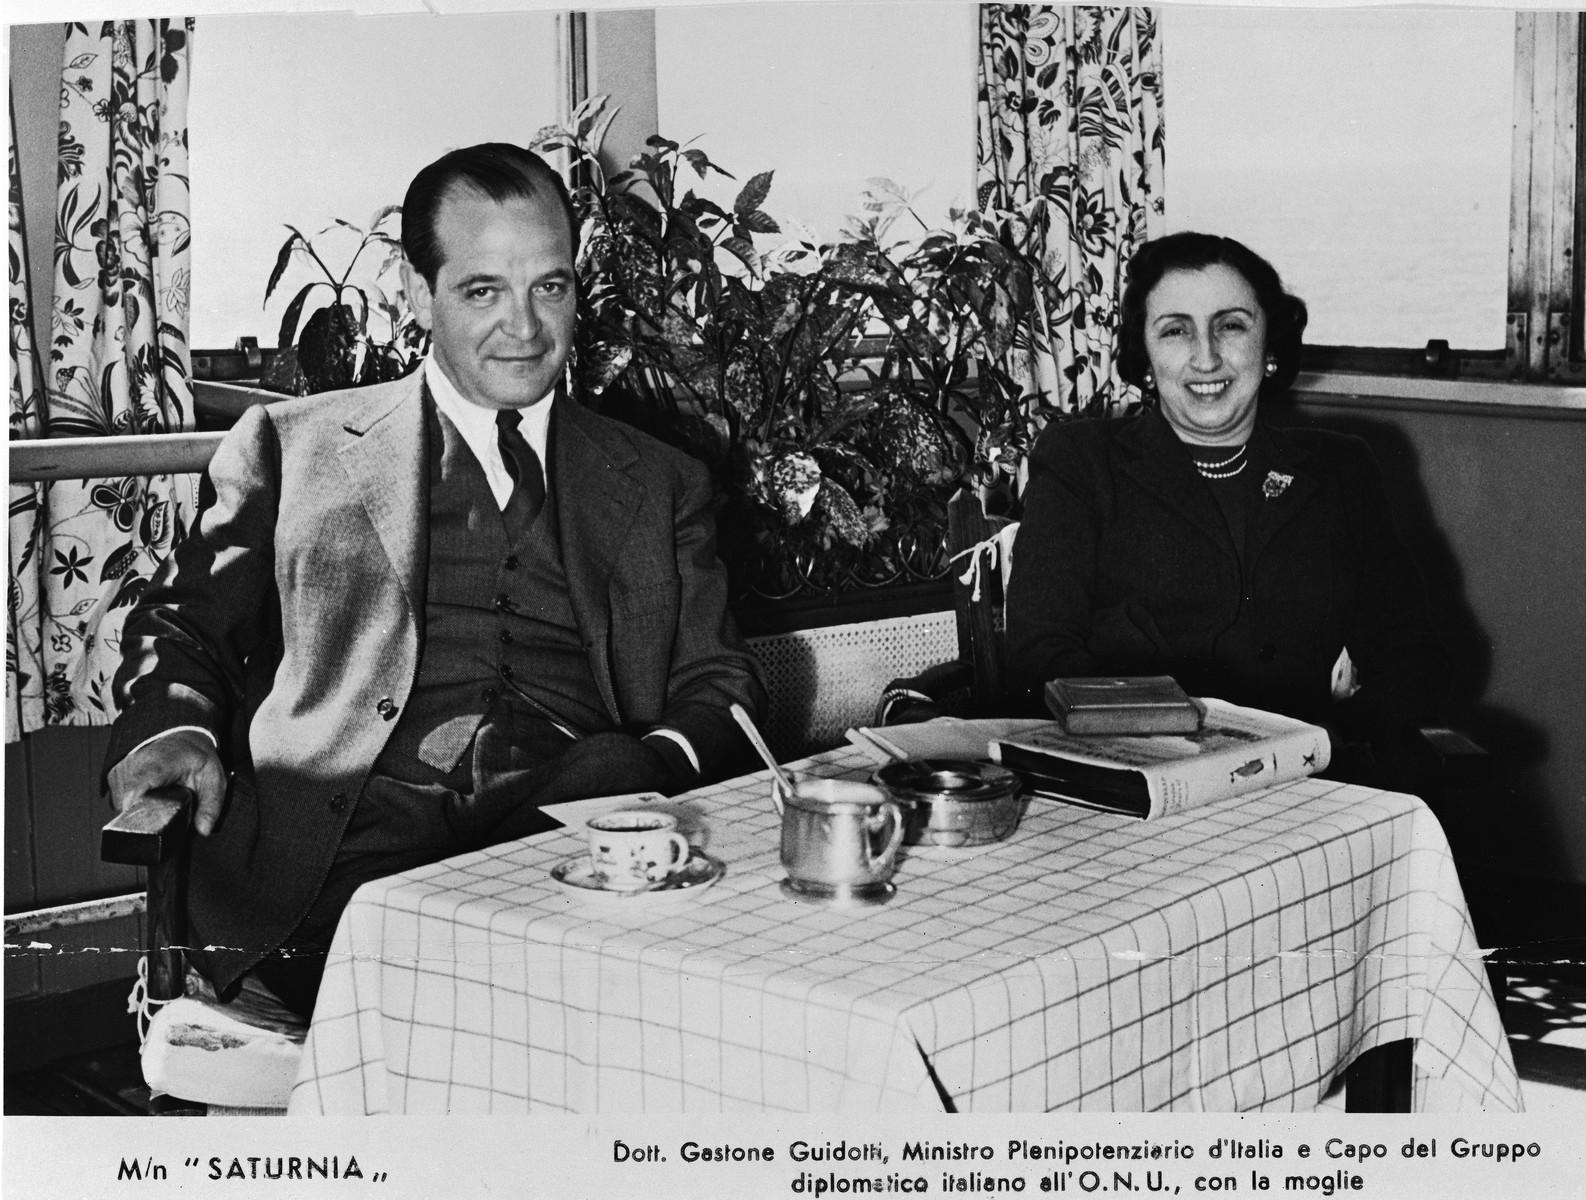 Italian diplomat Gastone Guidotti on board the SS Saturnia with is wife.